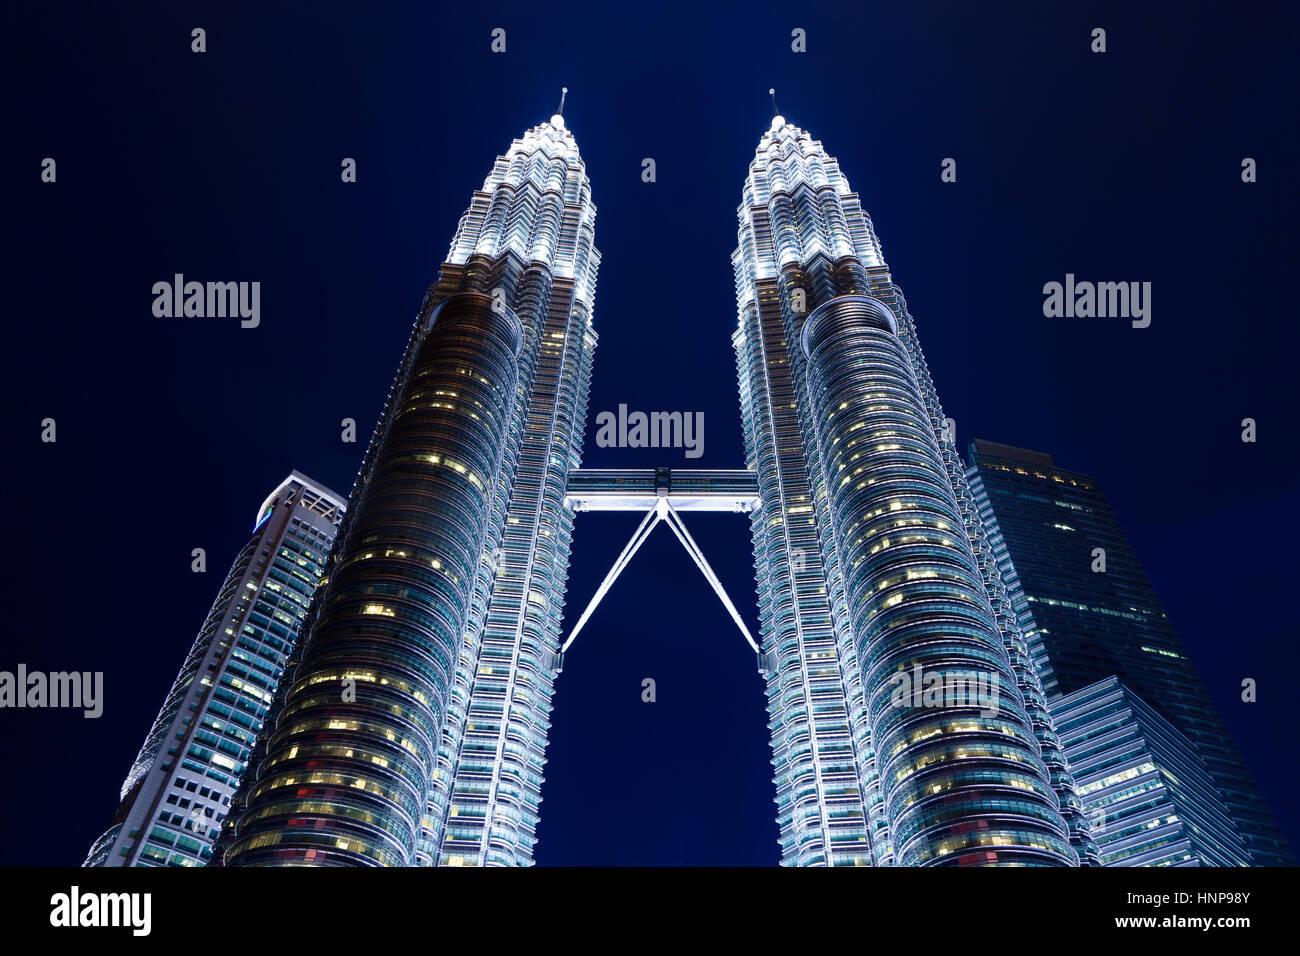 Petronas Twin Towers at night, Kuala Lumpur, Malaysia - Stock Image